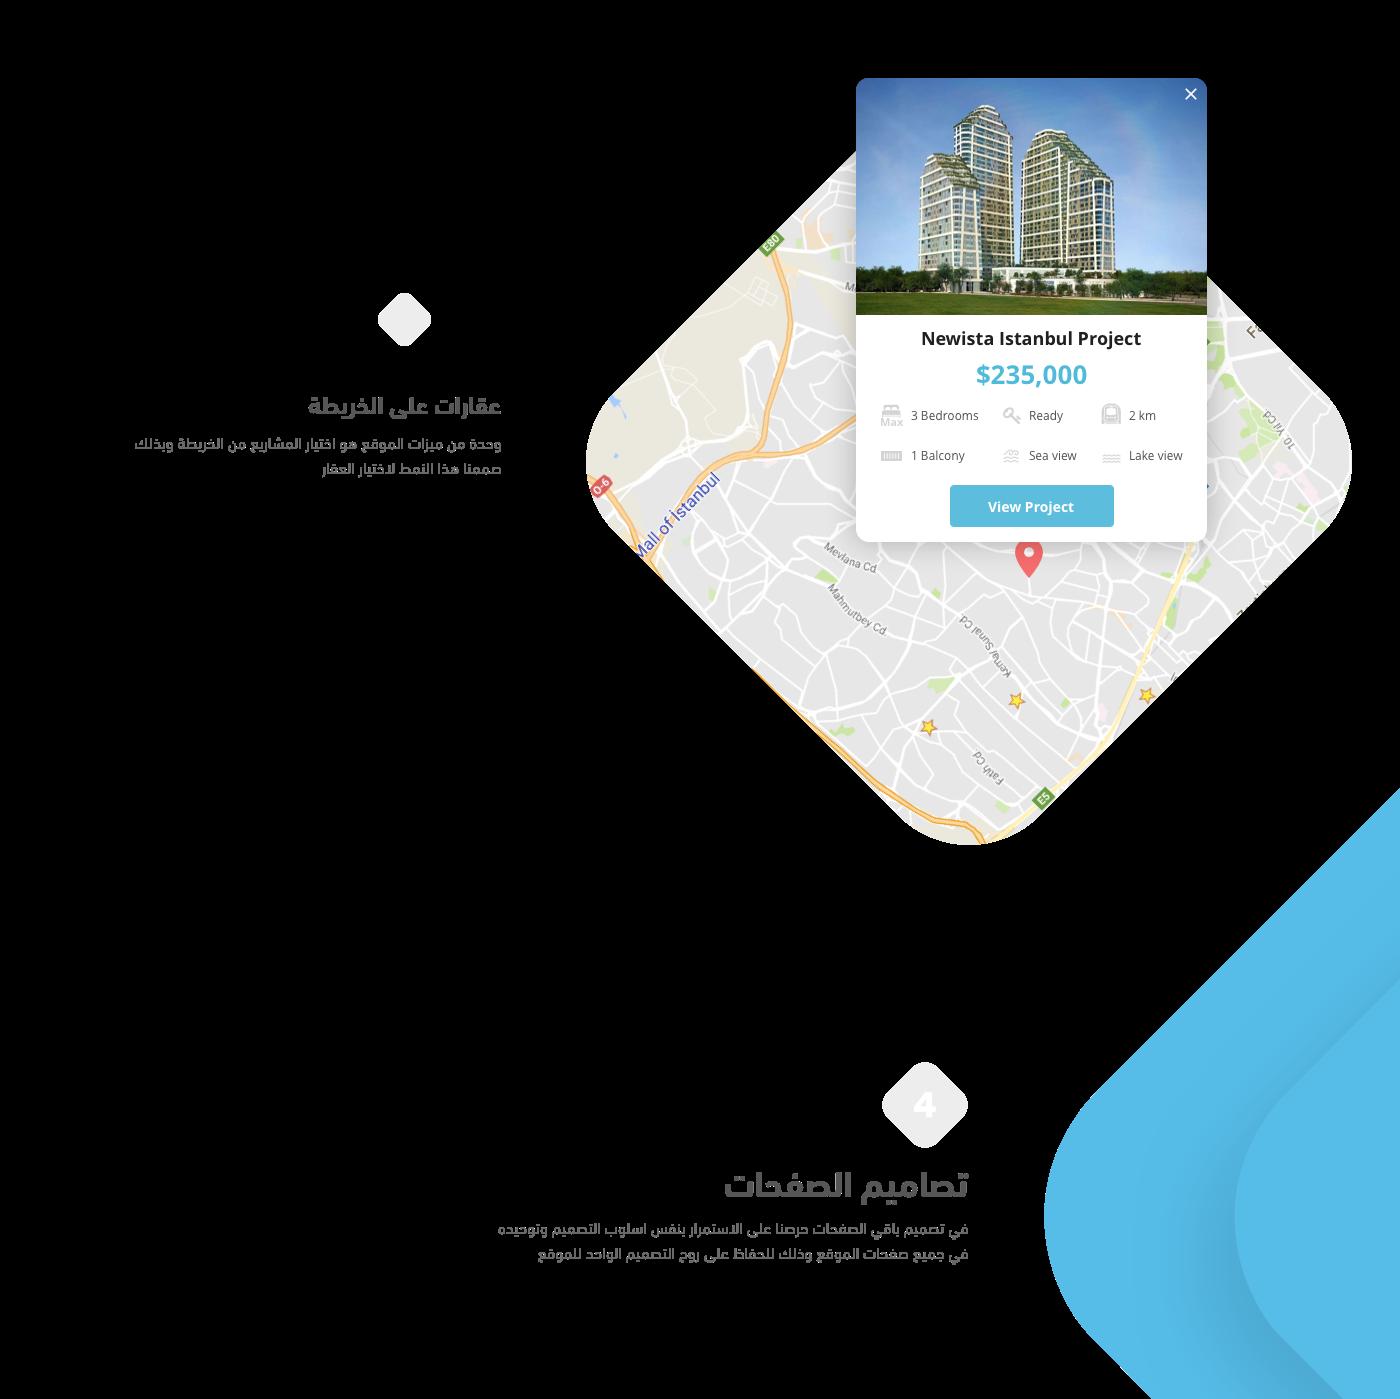 Web Design  UX design ui design property web design real estate web development  toriom Extra Property تصميم عقاري